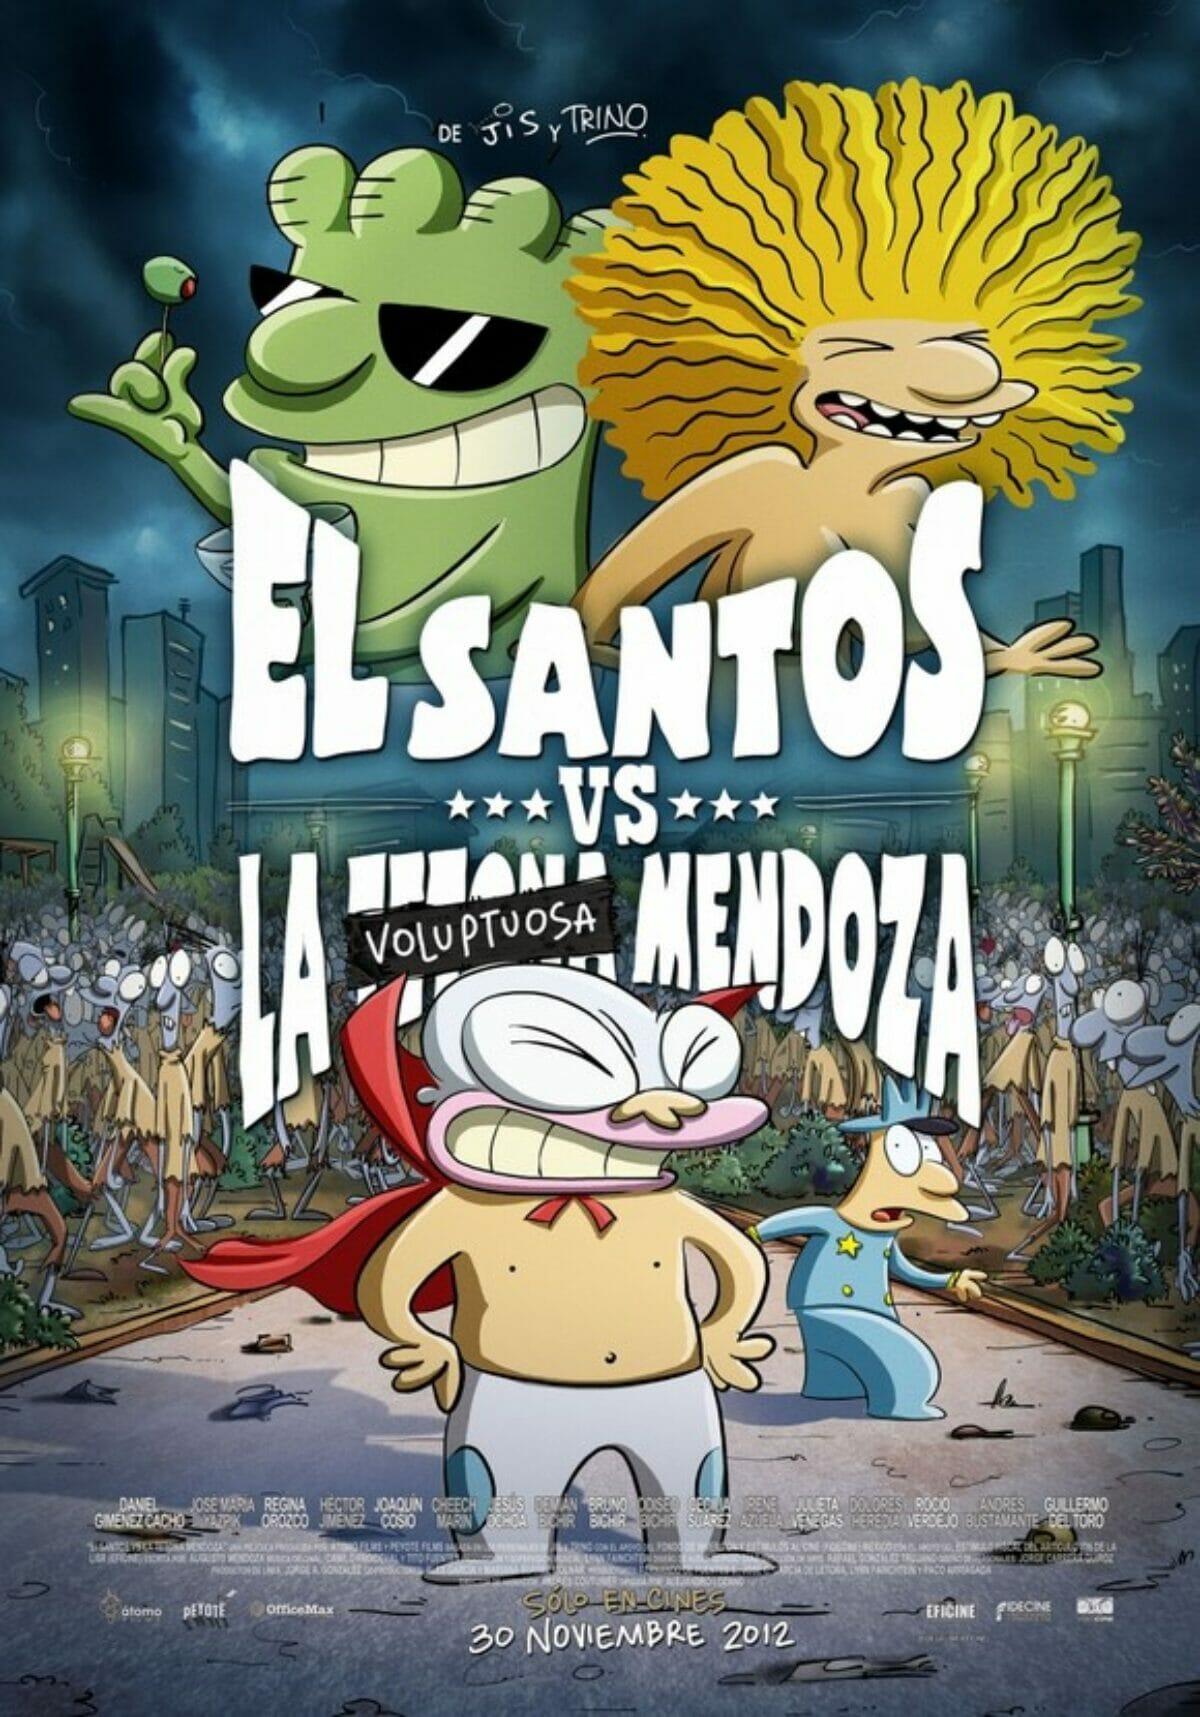 el-santos-vs-la-tetona-mendoza-poster